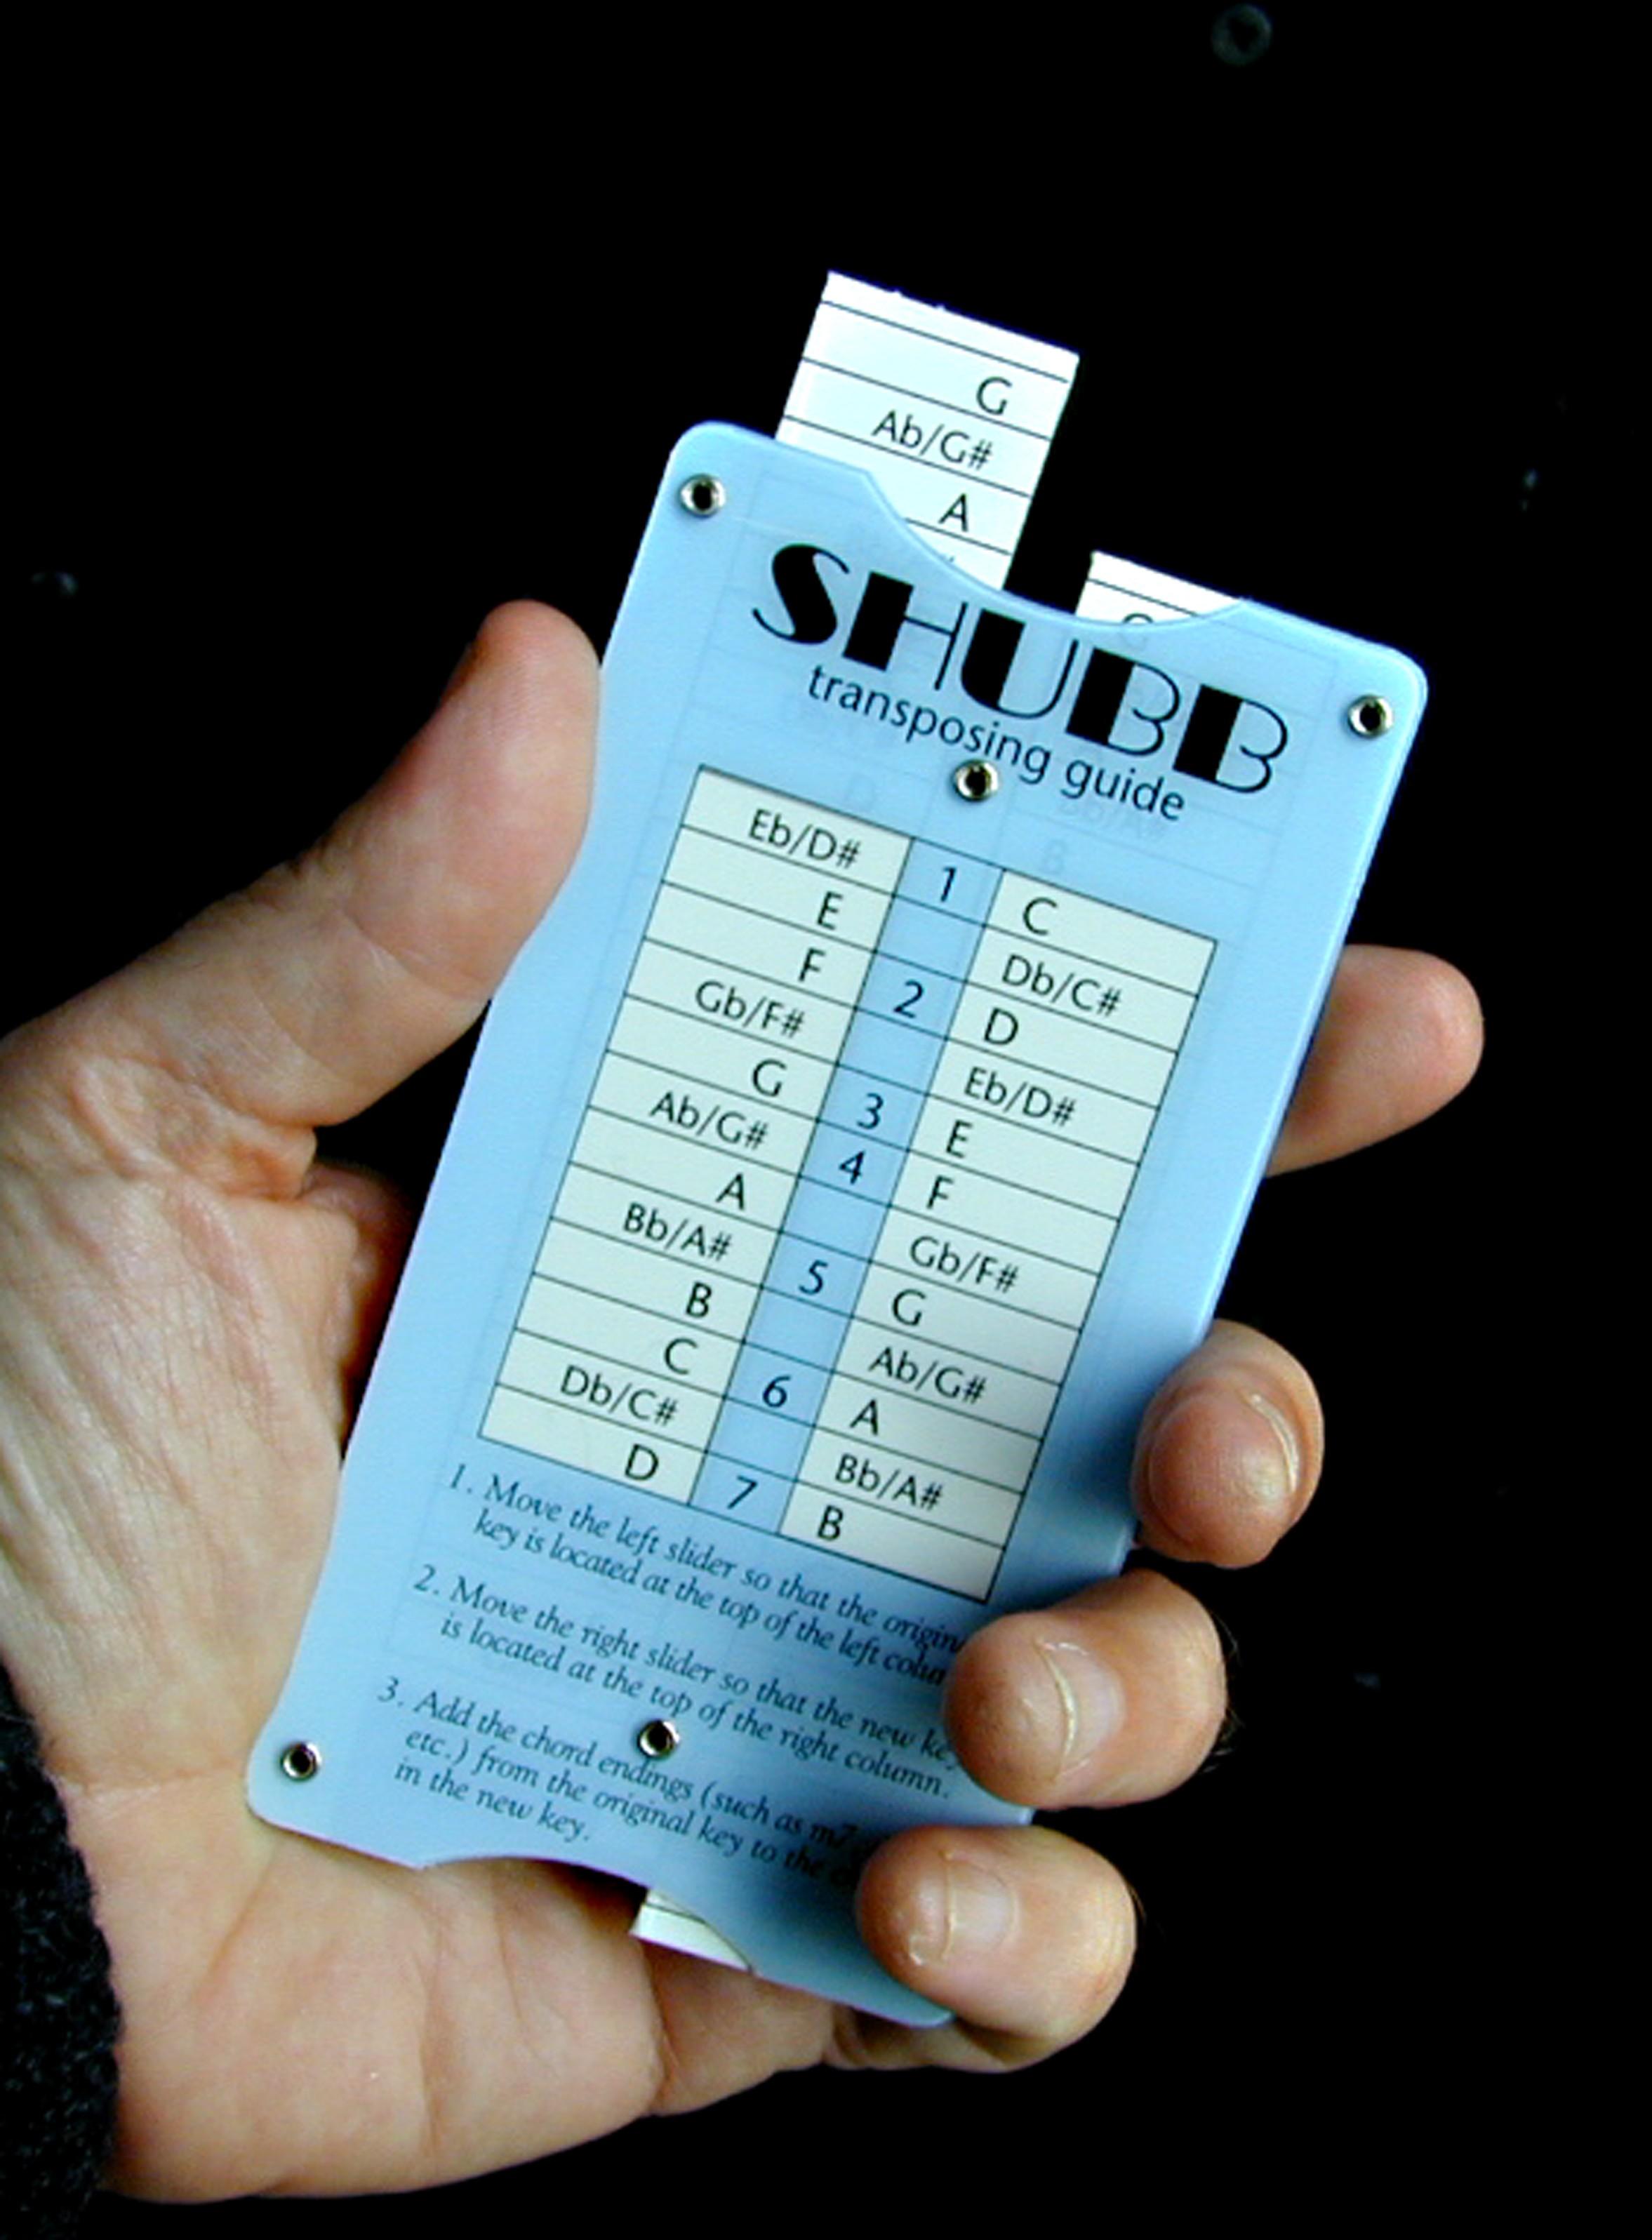 Shubb Transposing Guide